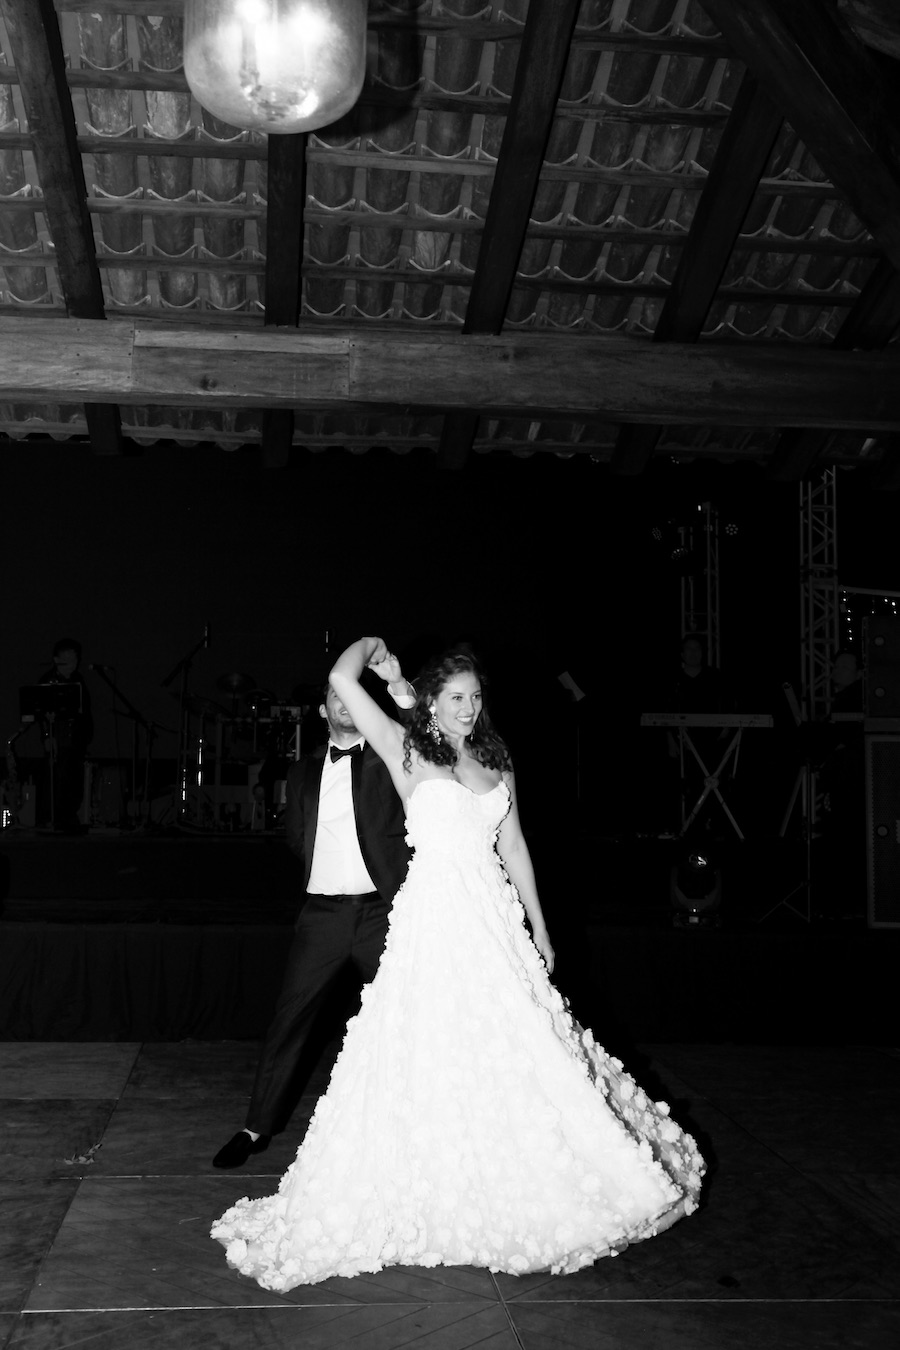 RMINE-Amirah-Kassem-Belathee-Photography-St-regis-punta-mita-17.JPG